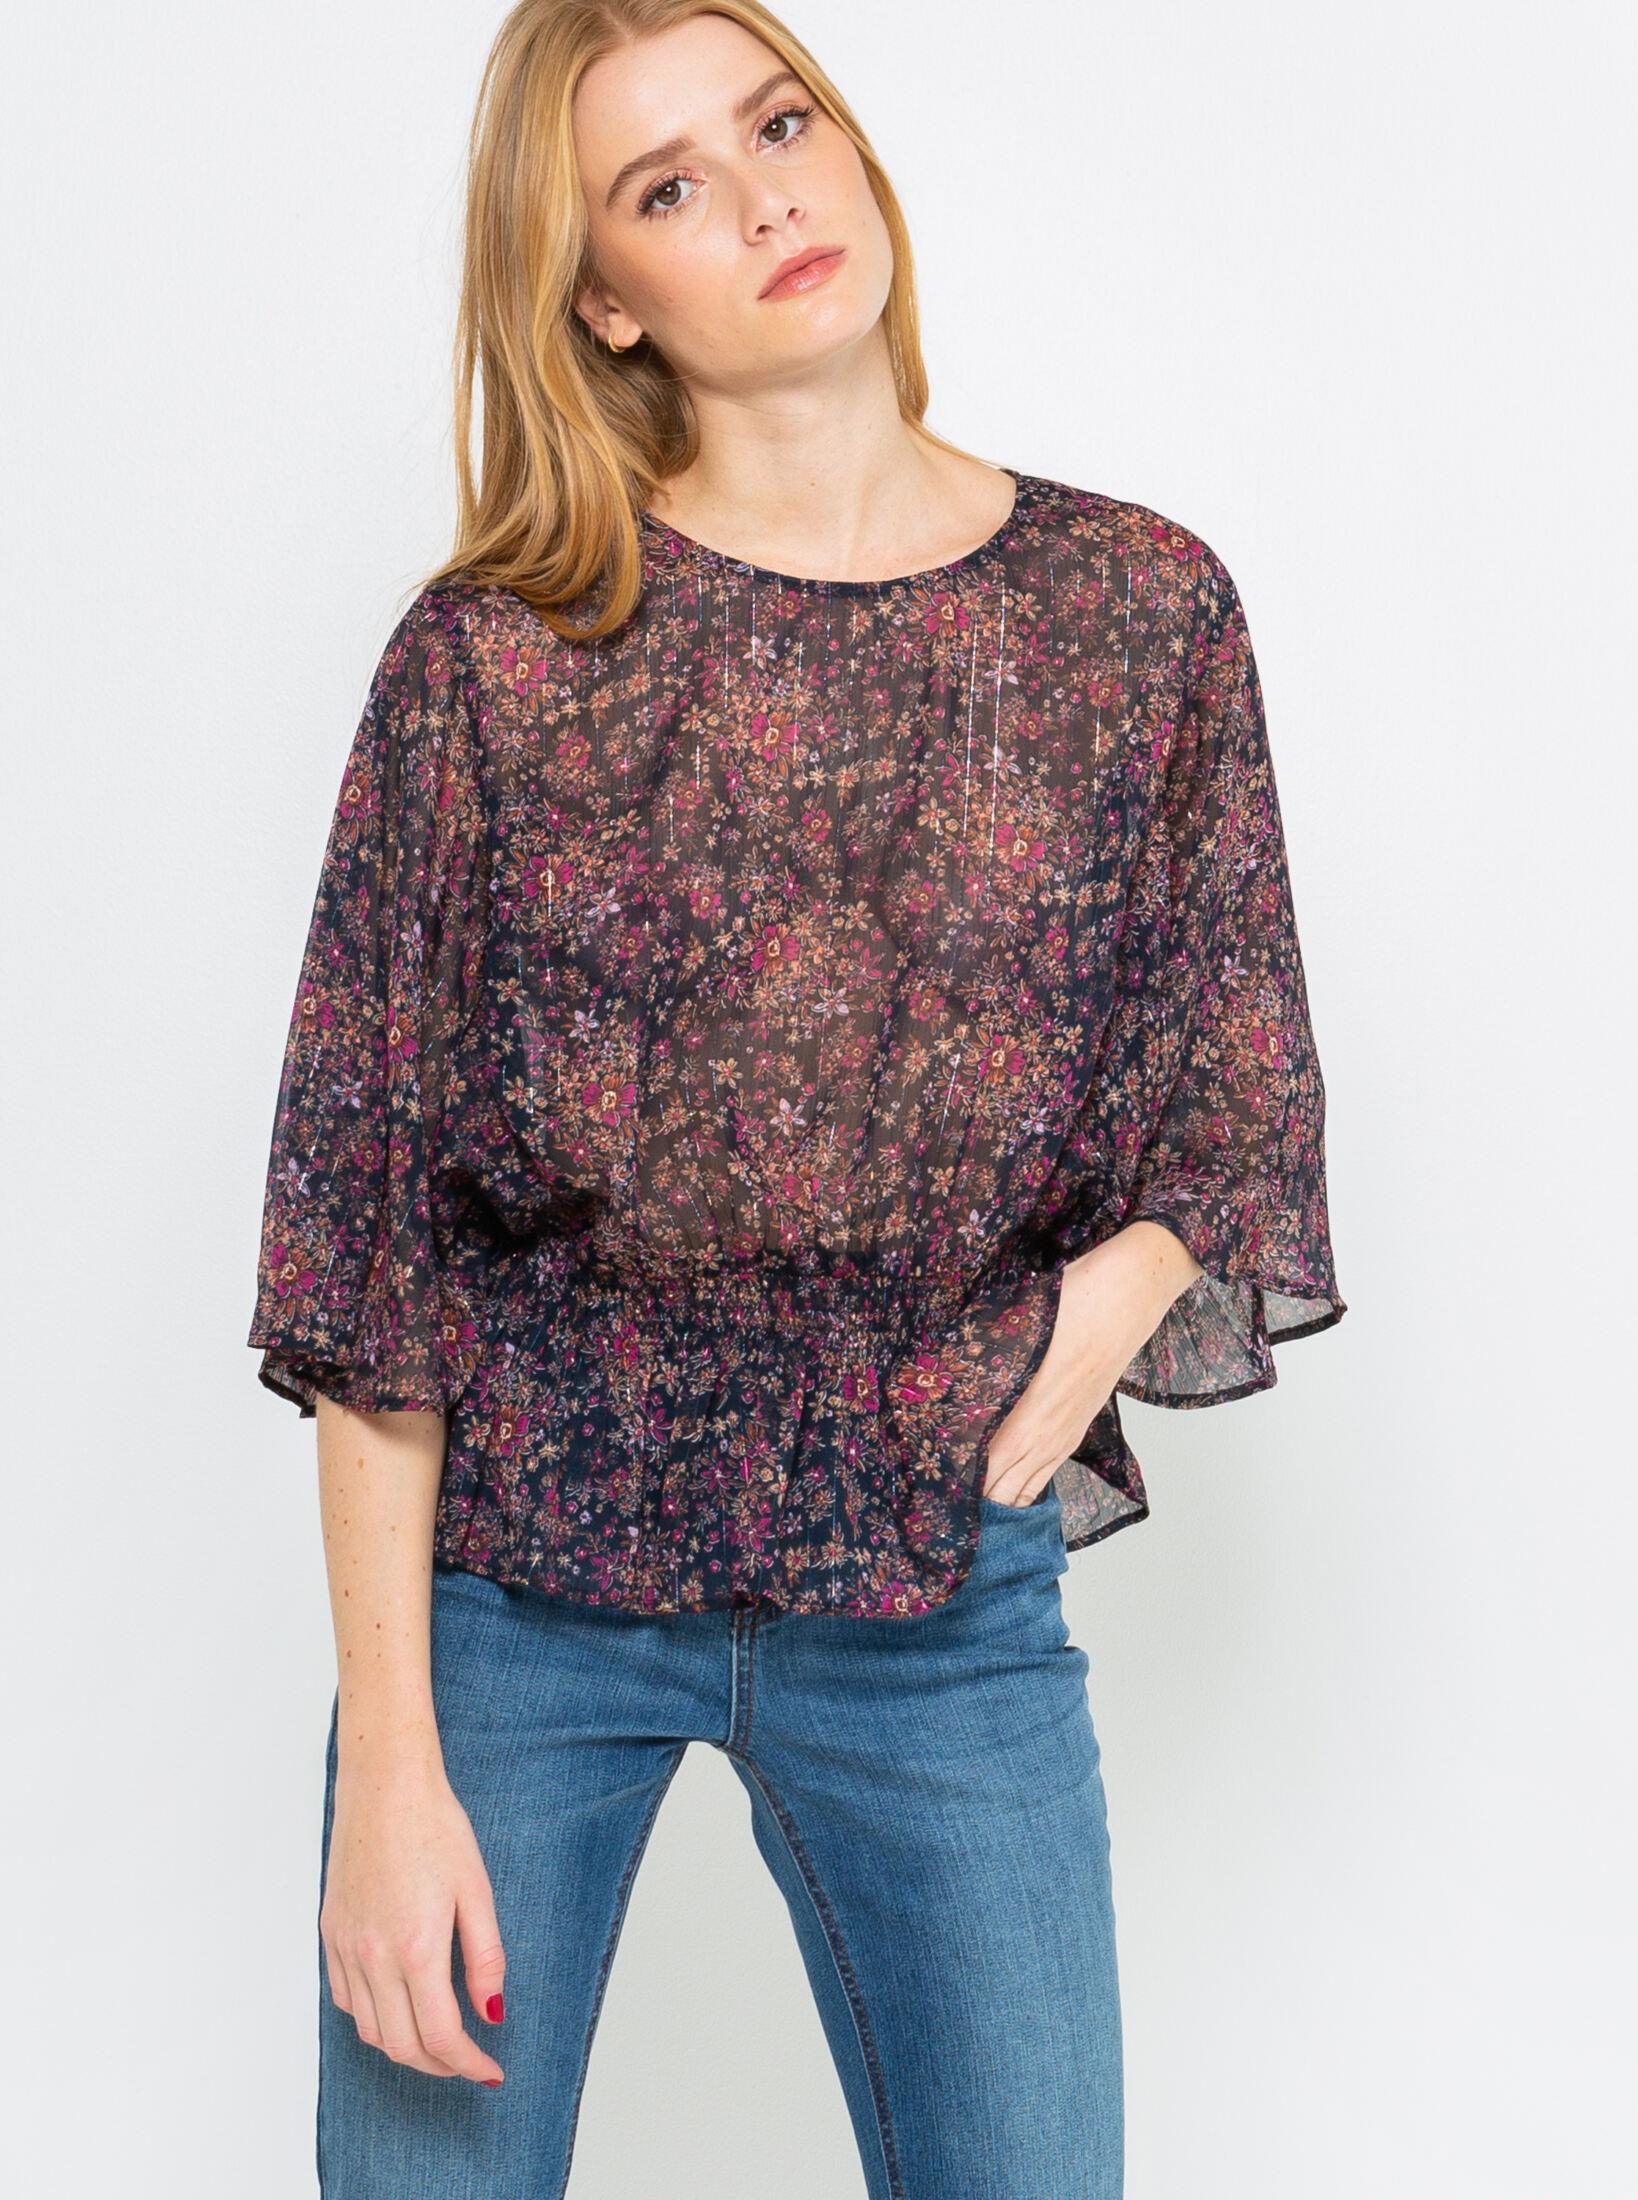 CAMAIEU Women's blouse violet